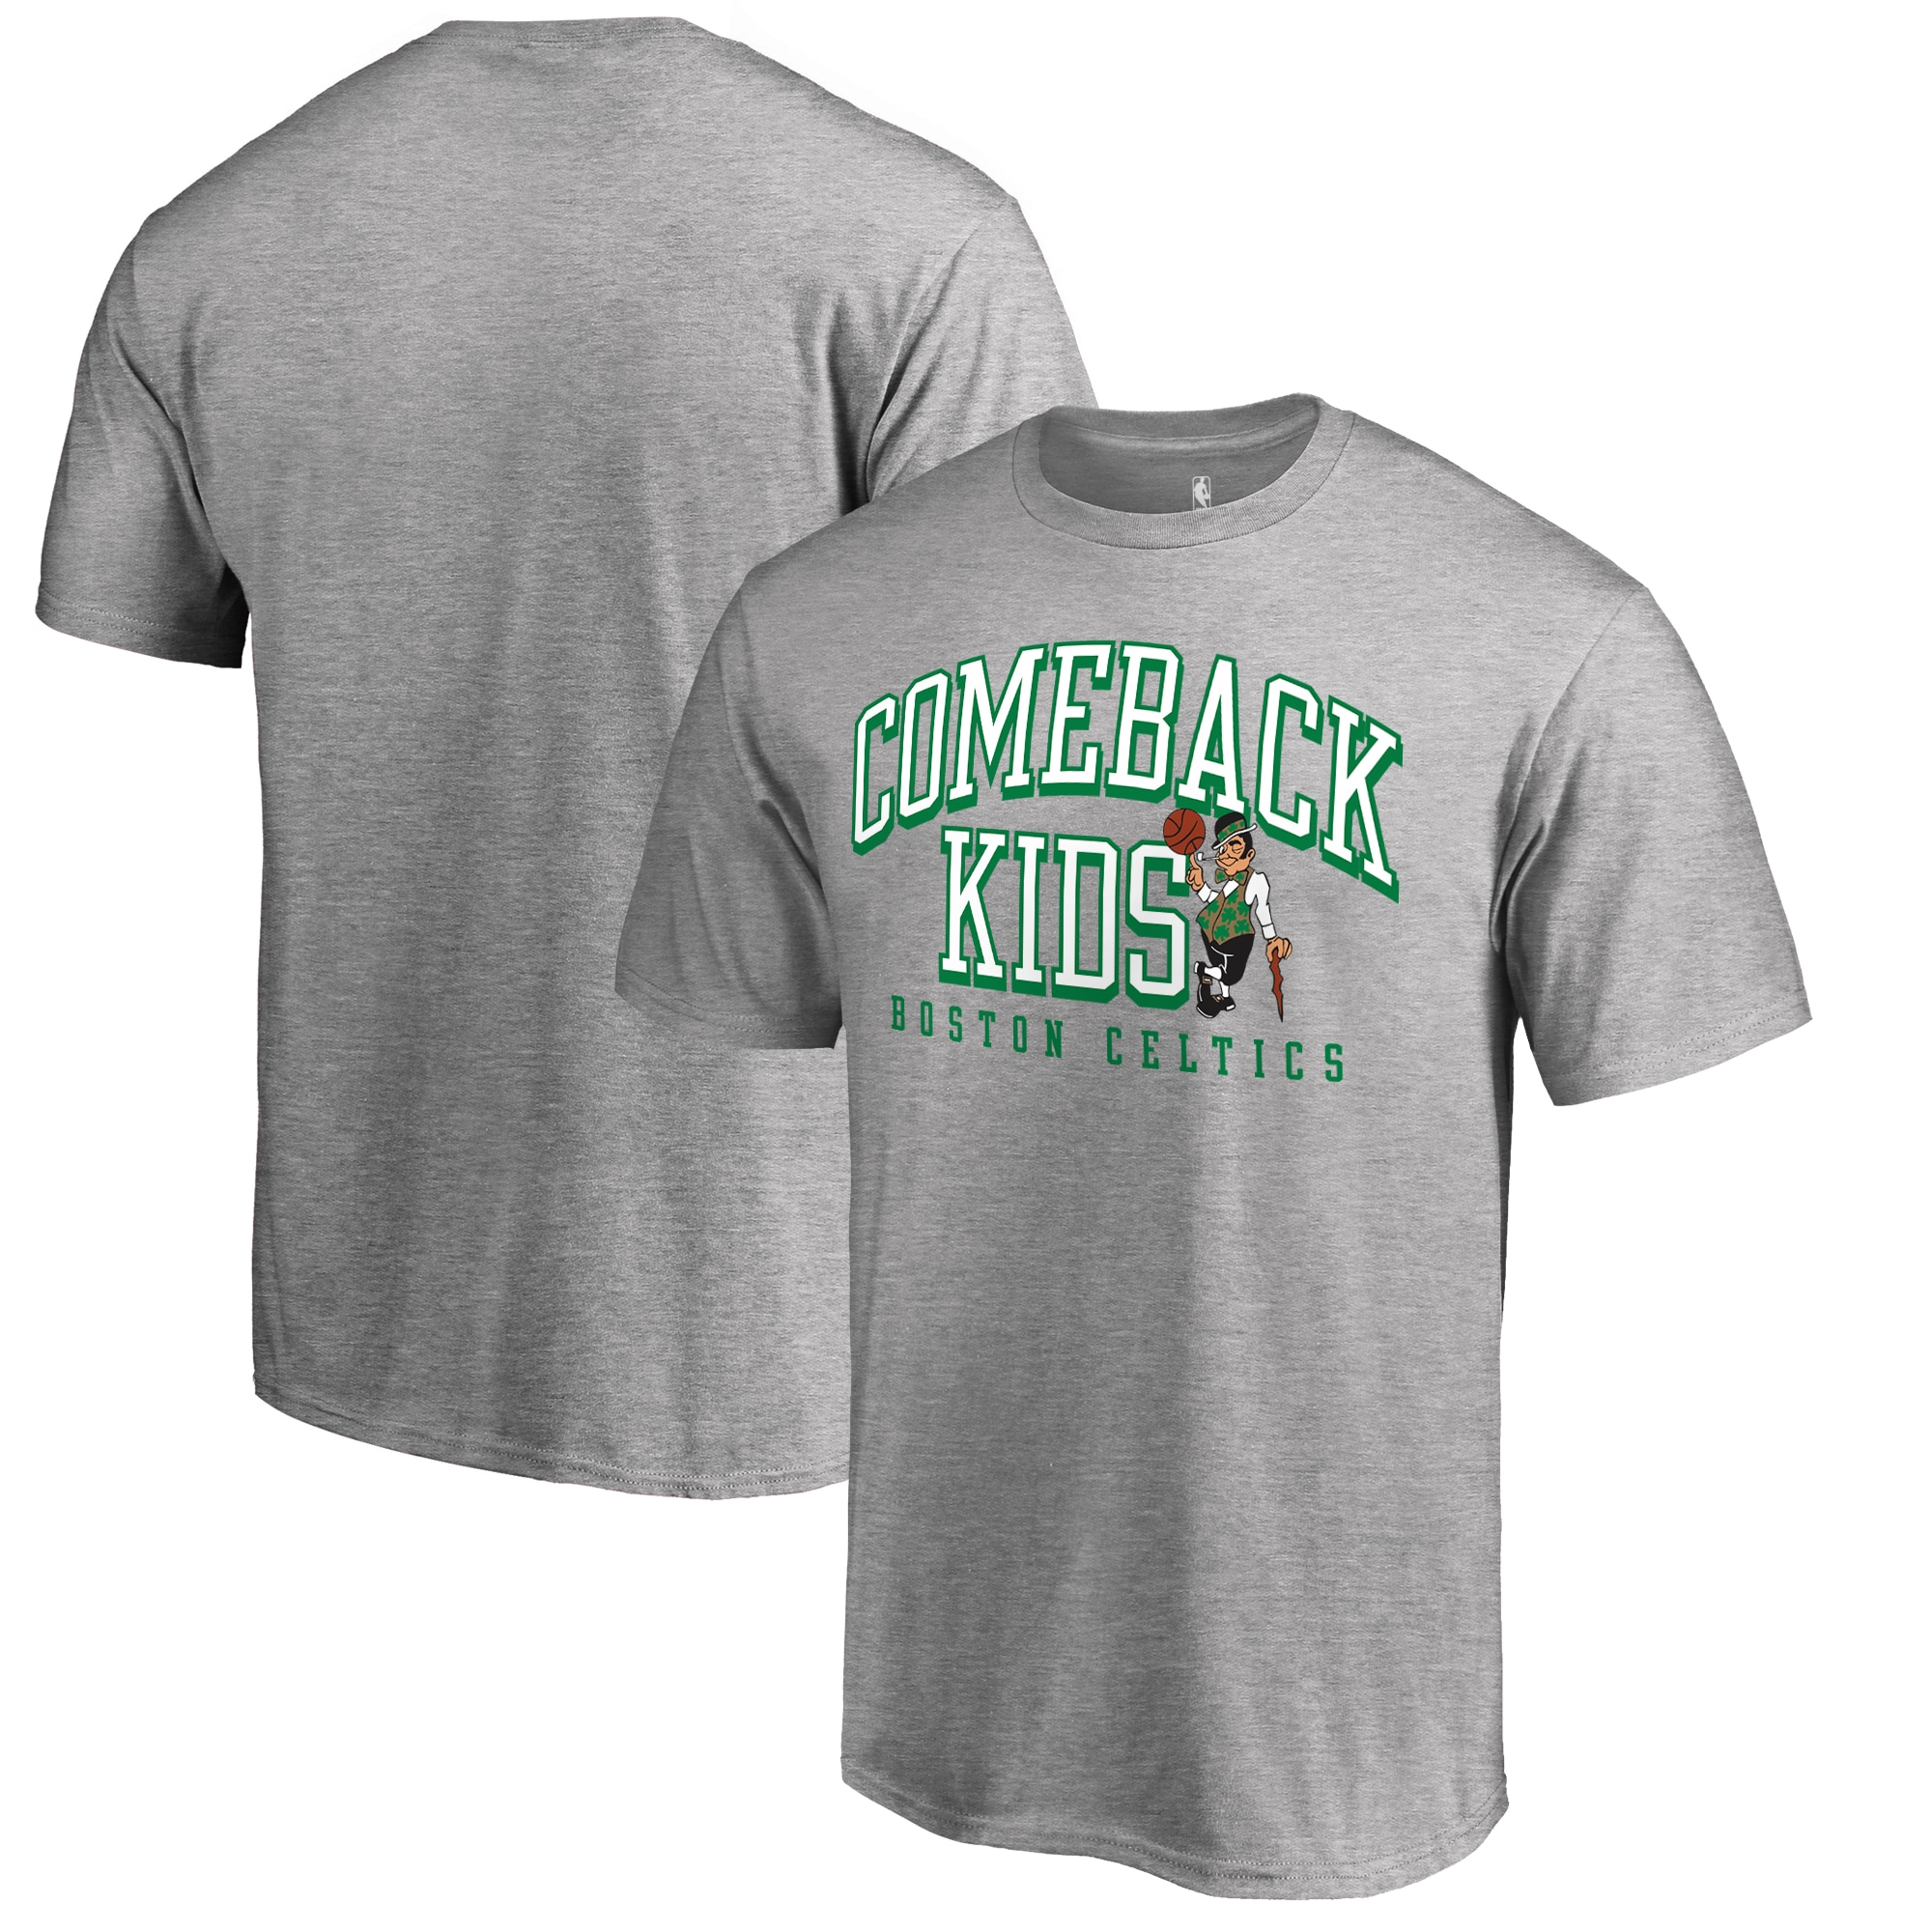 Boston Celtics Fanatics Branded Comeback Kids T-Shirt - Heathered Gray